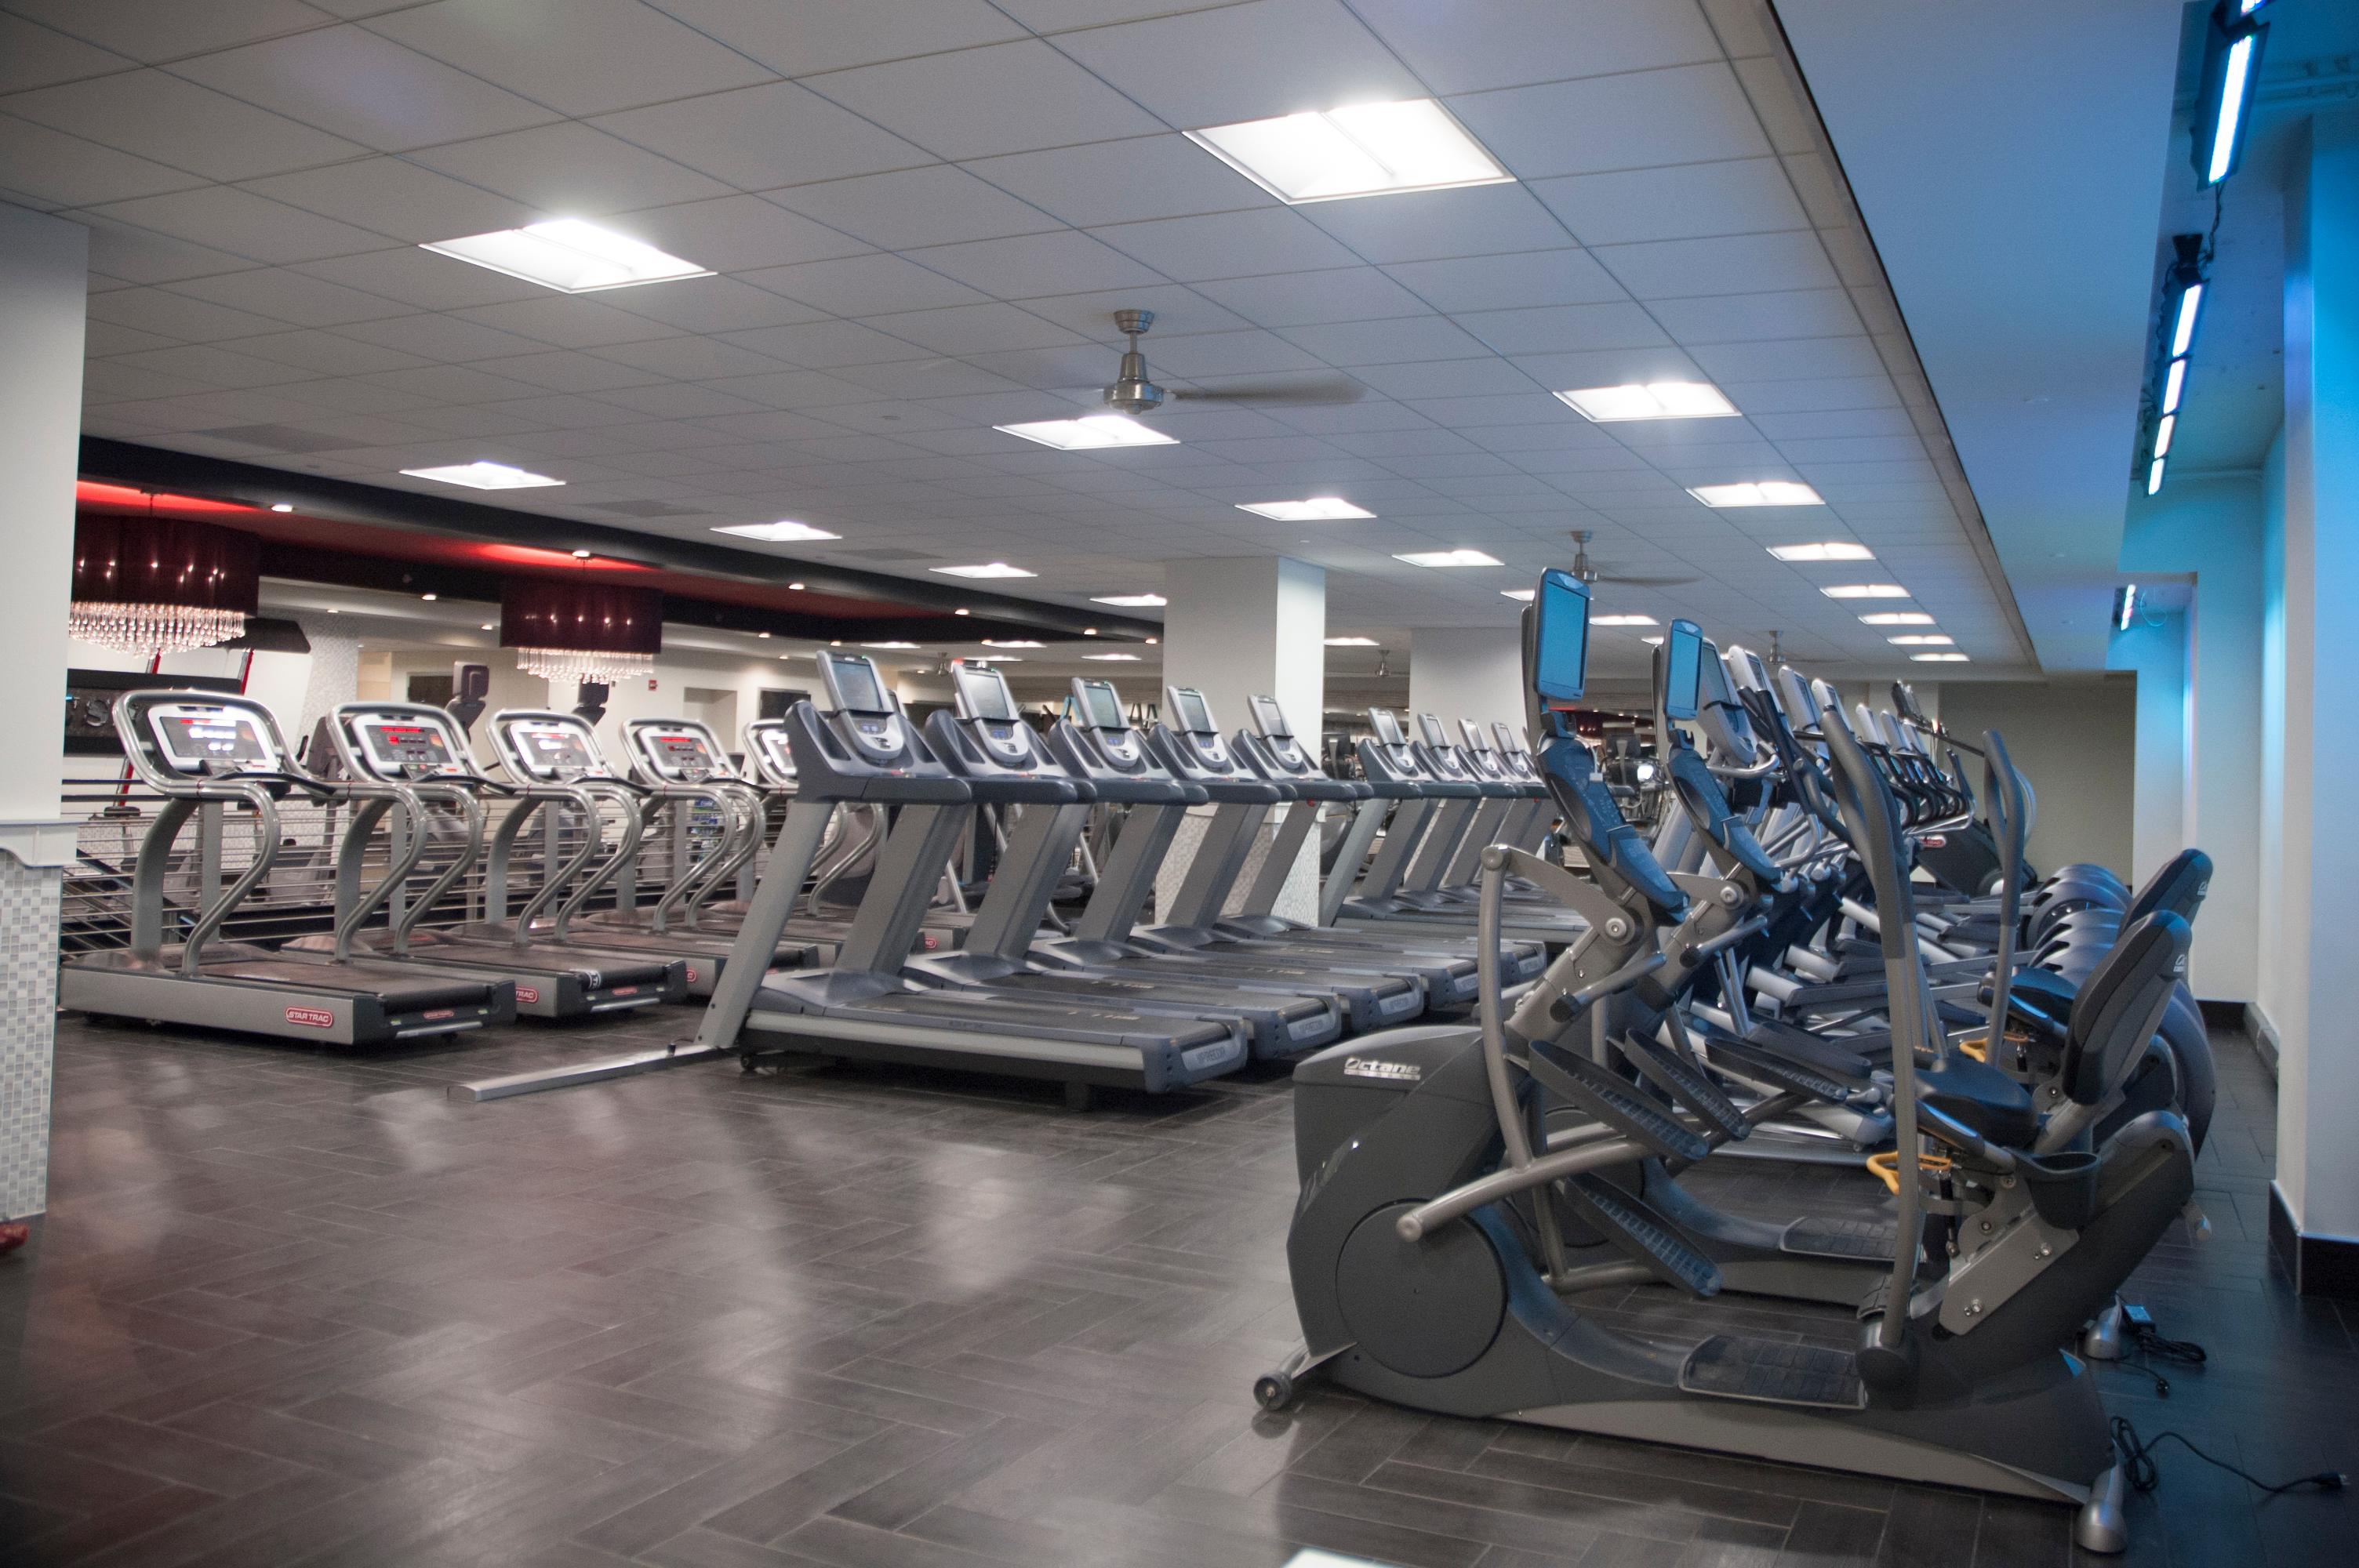 Crunch Fitness - Reston Town Center image 4